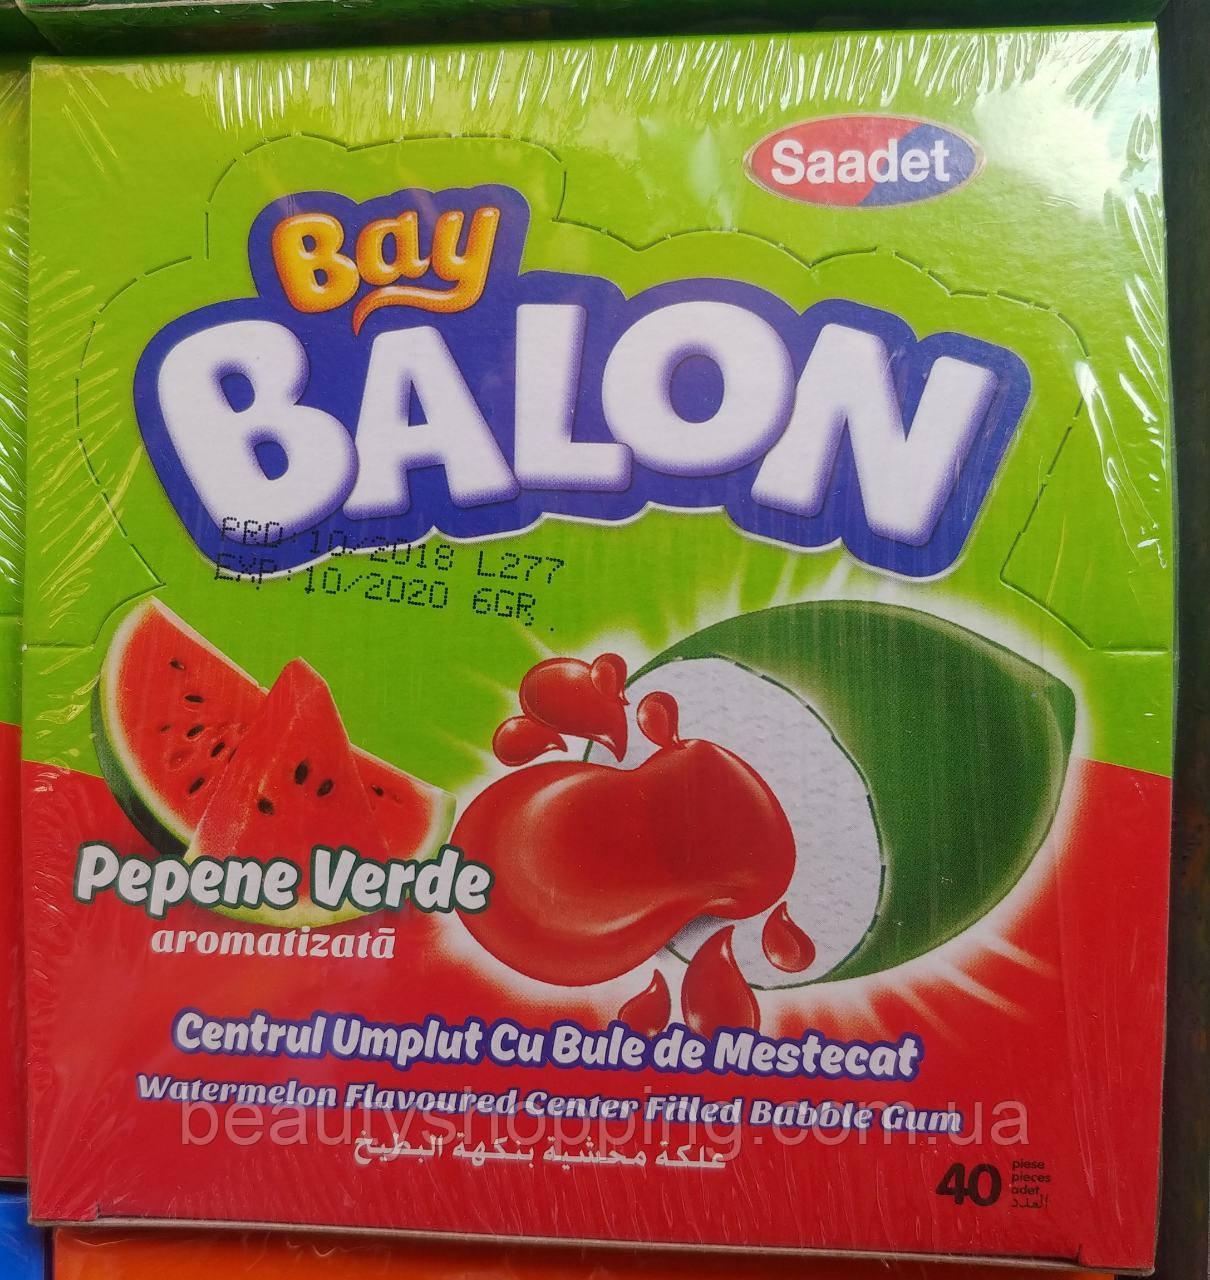 Bay Balon Watermelon жевательная резинка с жидким центром со вкусом арбуза 40 шт Saadet Турция